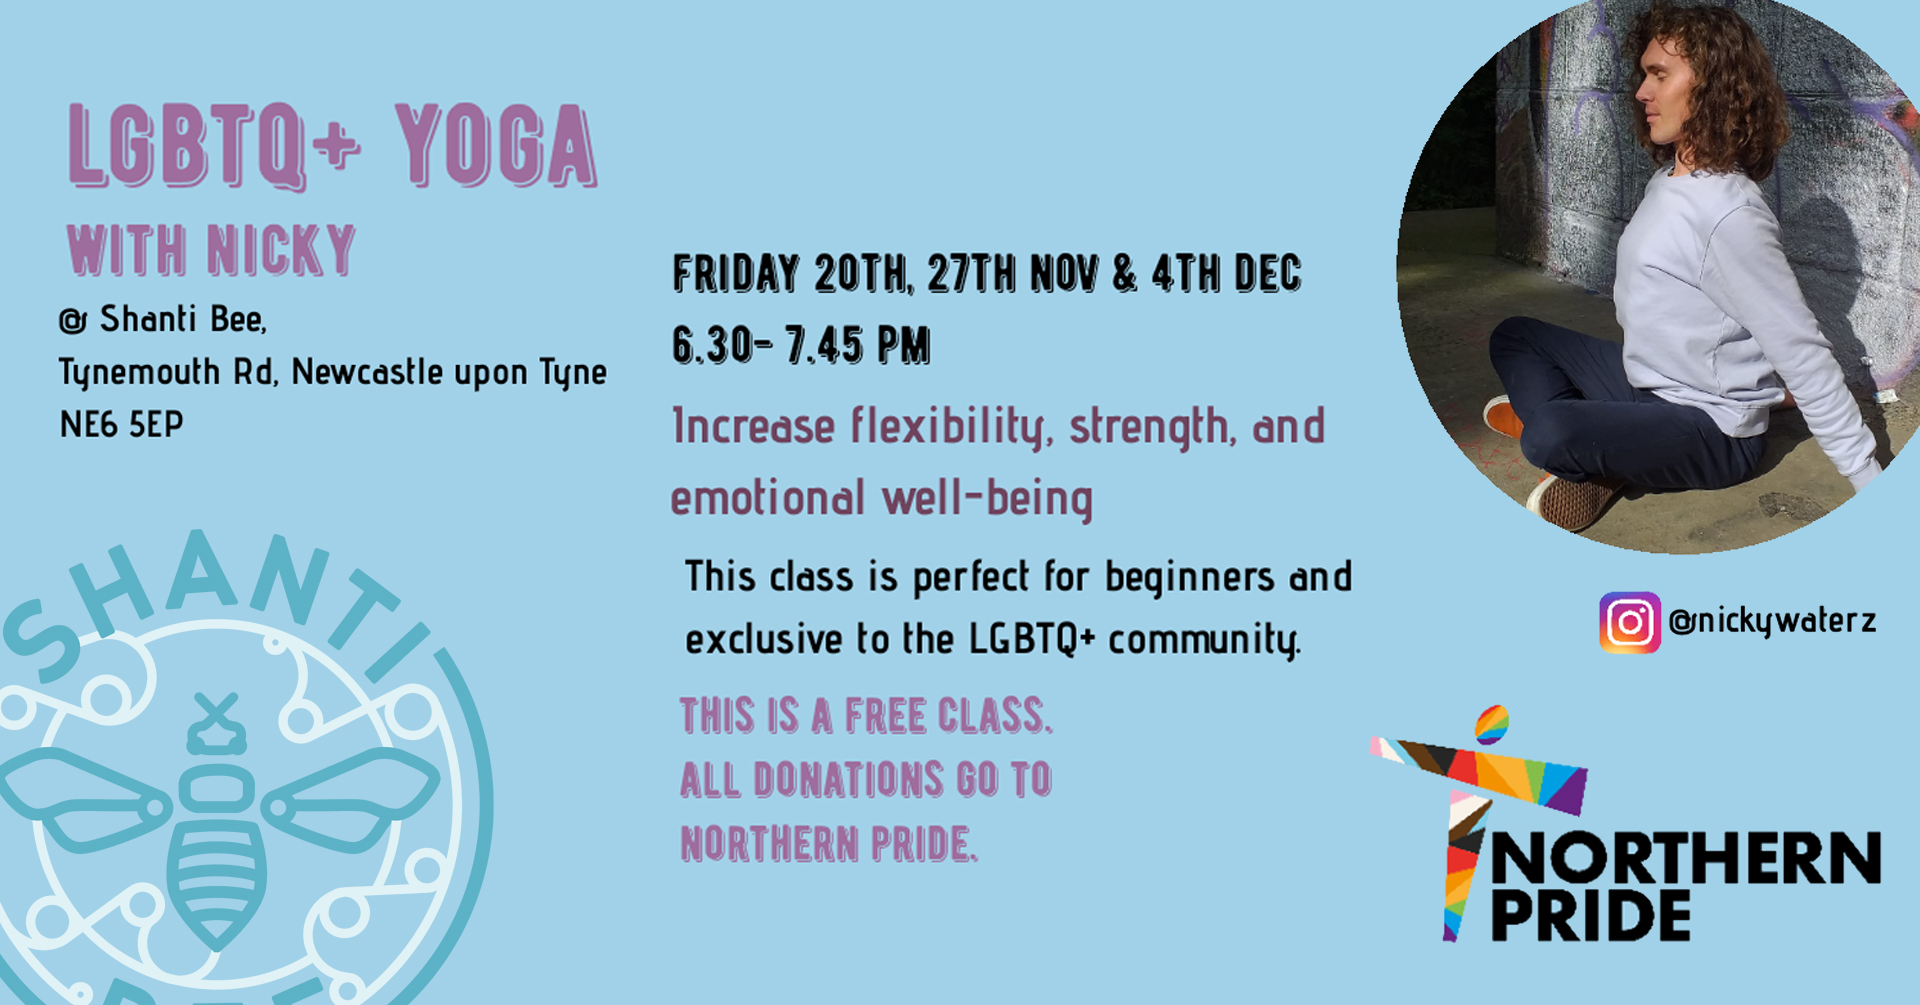 LGBTQ+ Yoga with Nicky